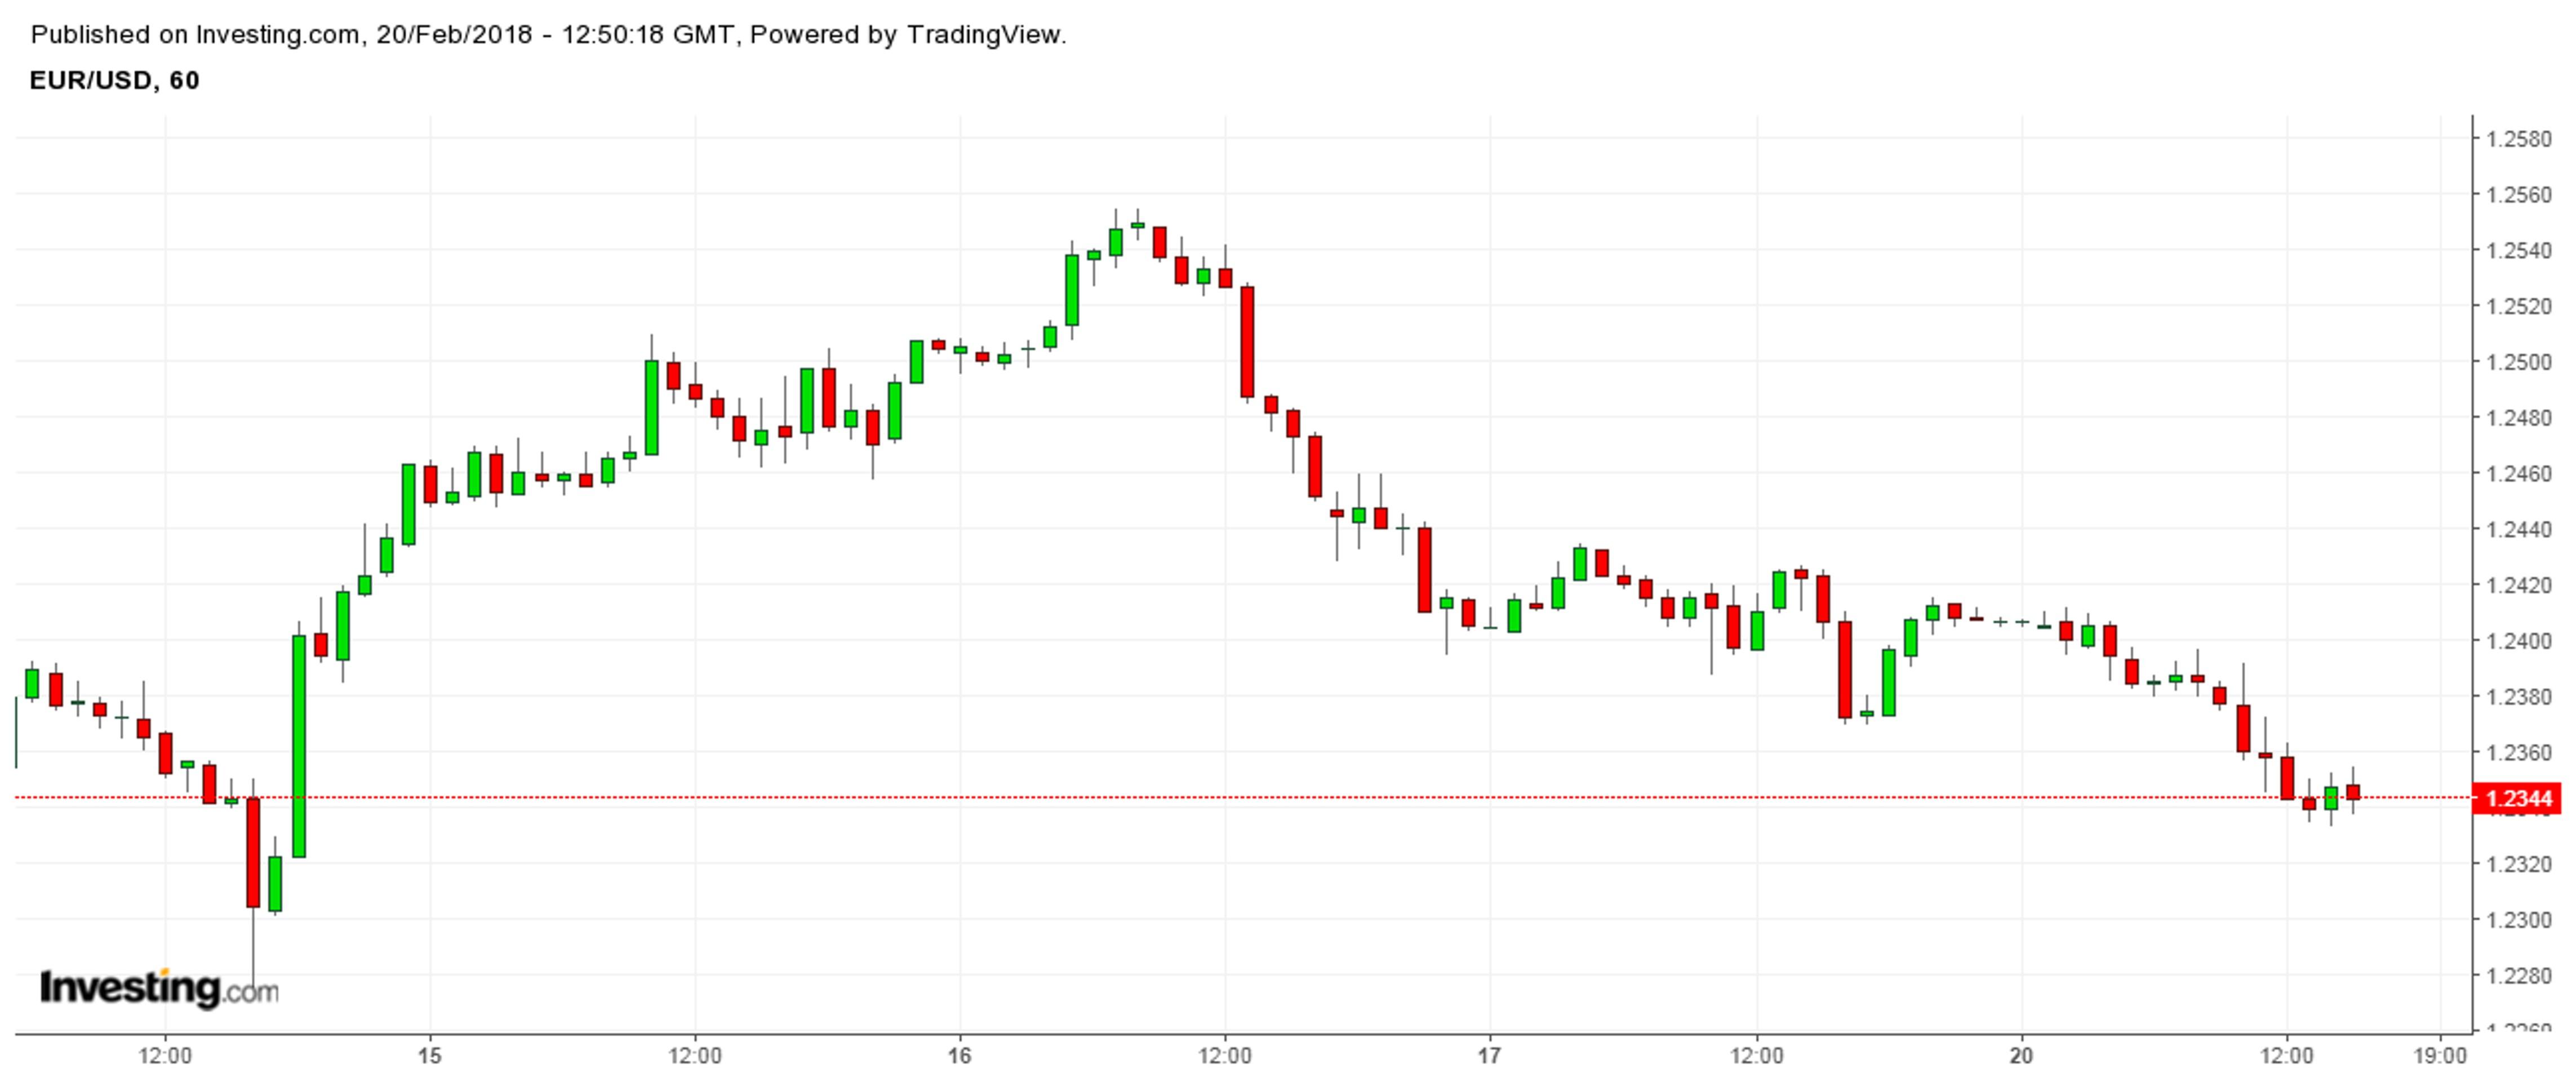 Обвал доллара прекратился. Надолго ли?